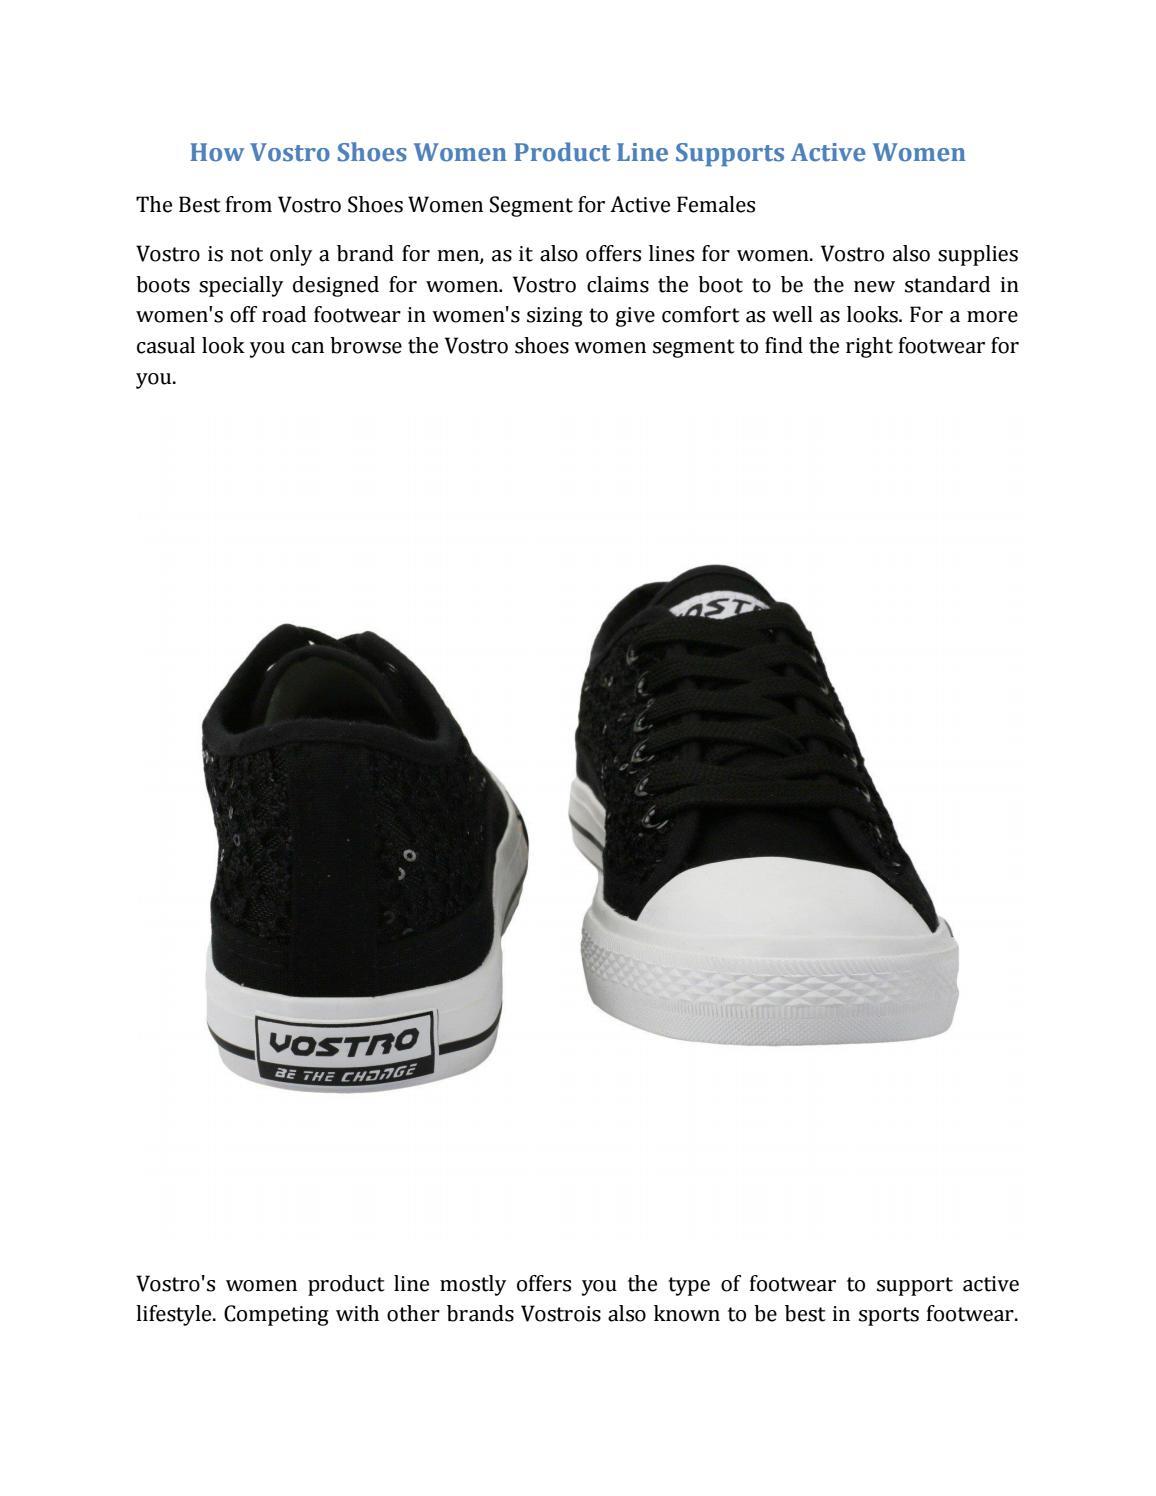 How vostro shoes women product line